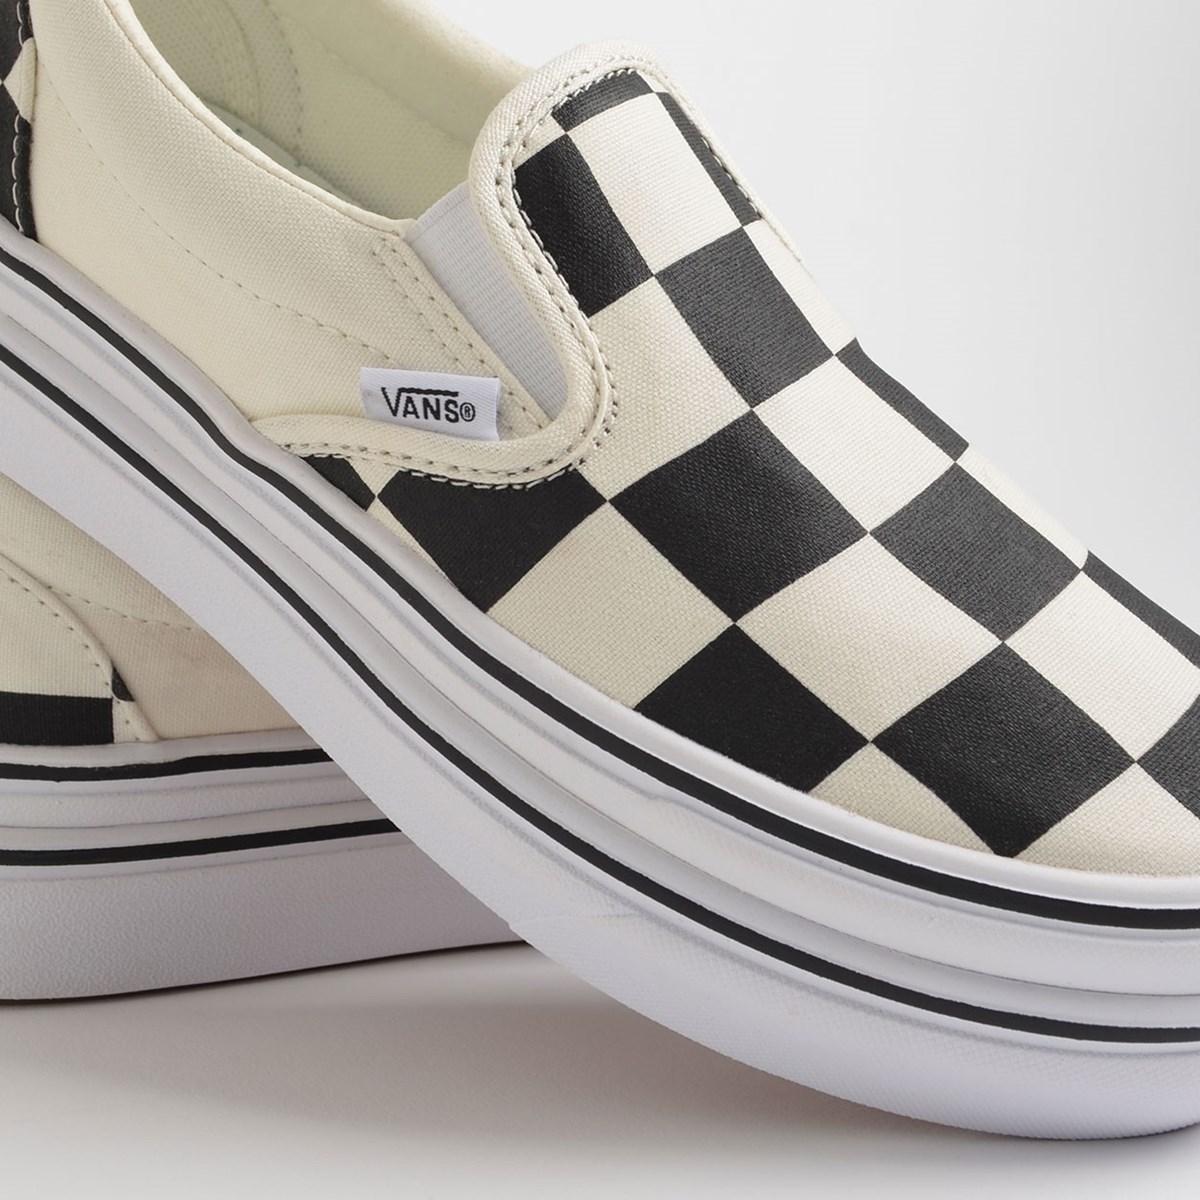 Tênis Vans Super Comfycush Slip On Big Classics Checker Black Off White VN0A4U1FXT4